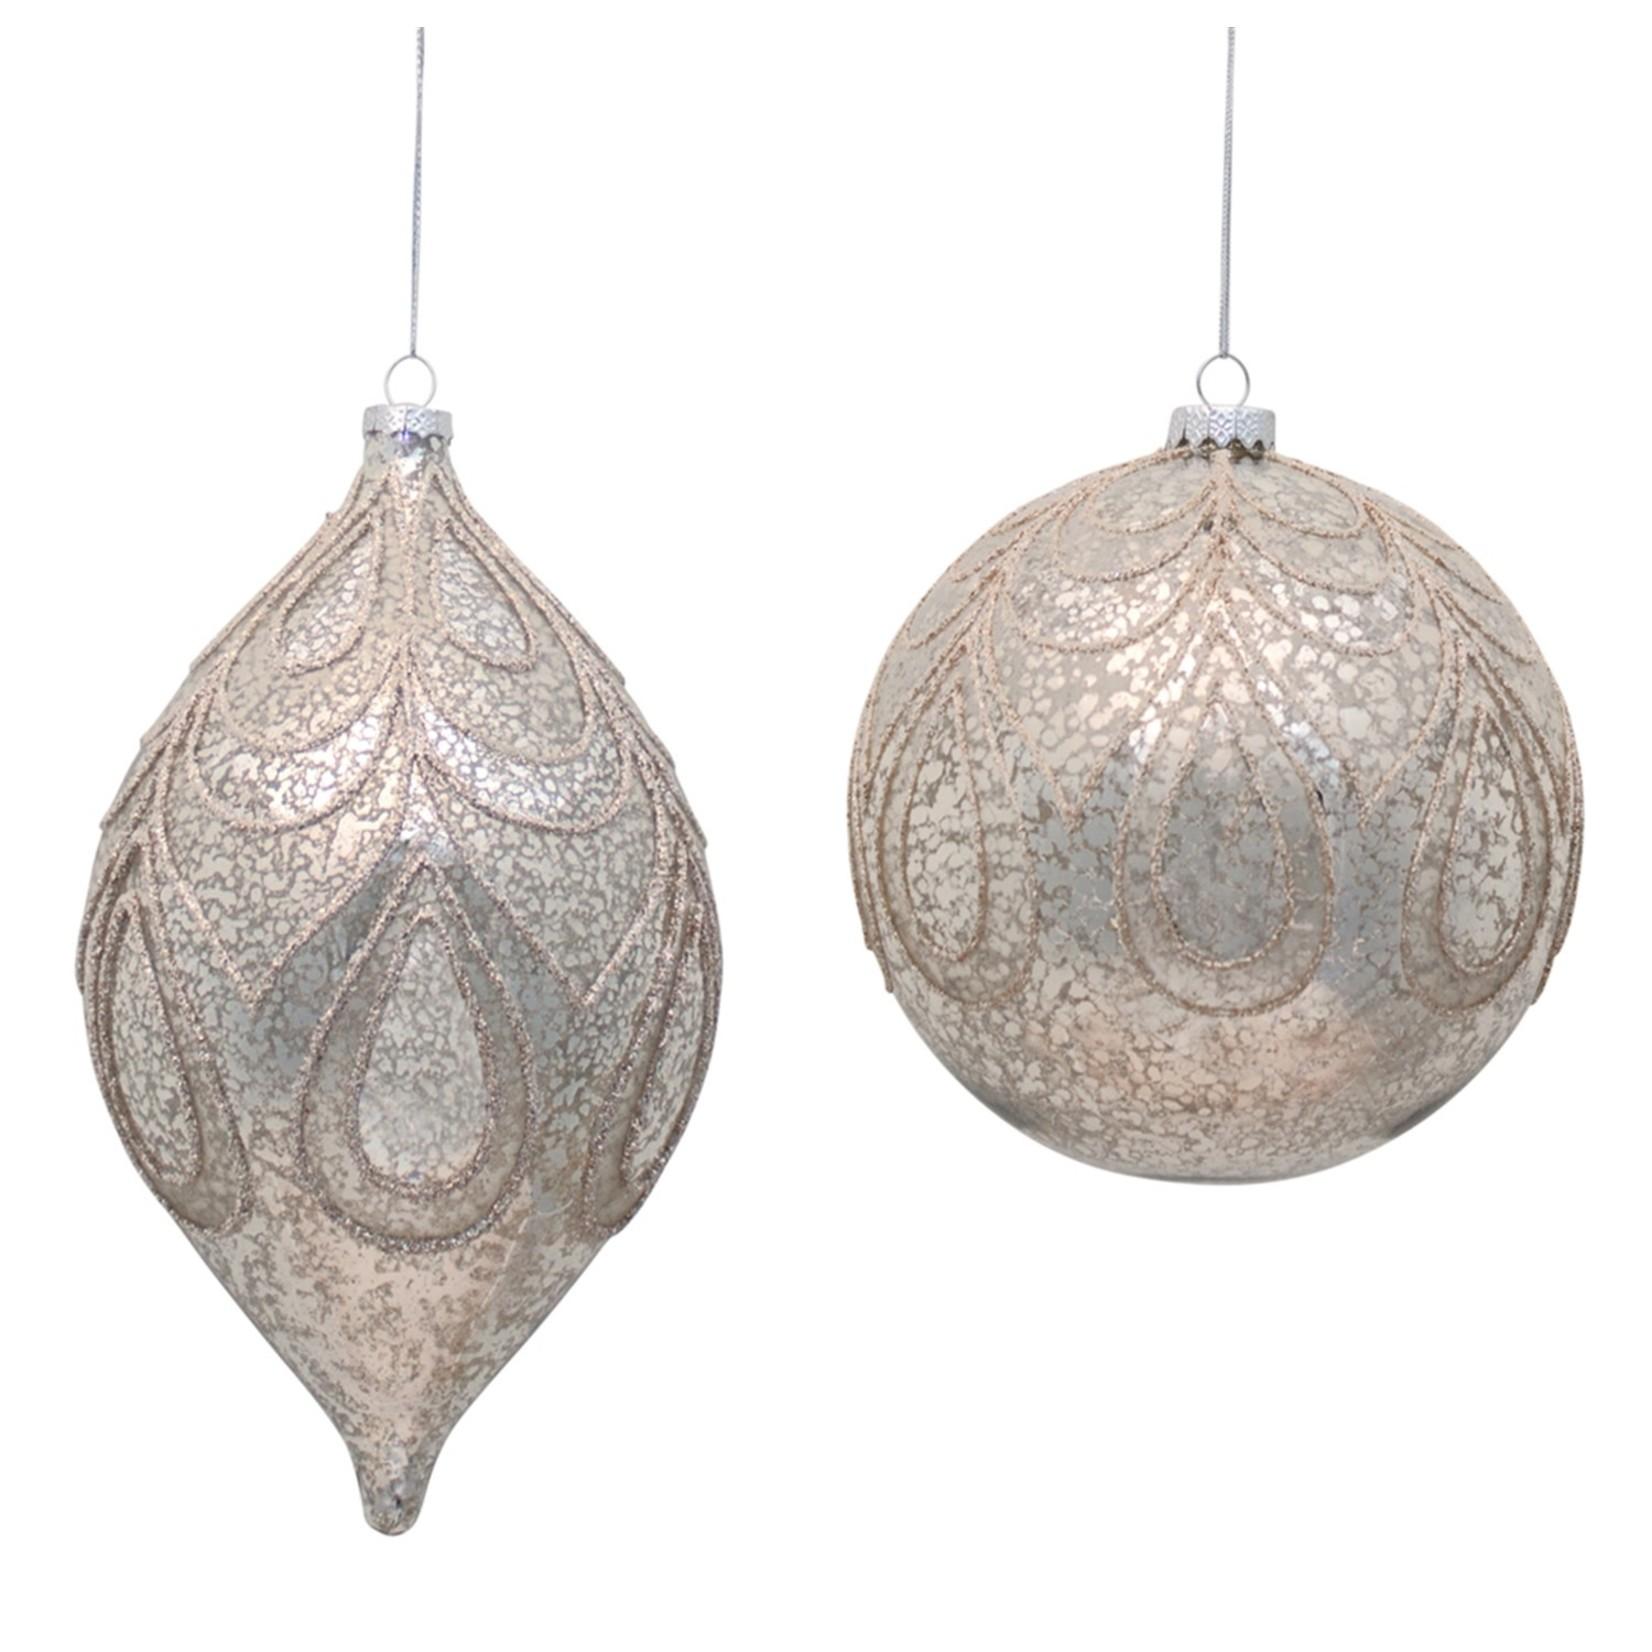 Oversized Mercury Glass Ornament